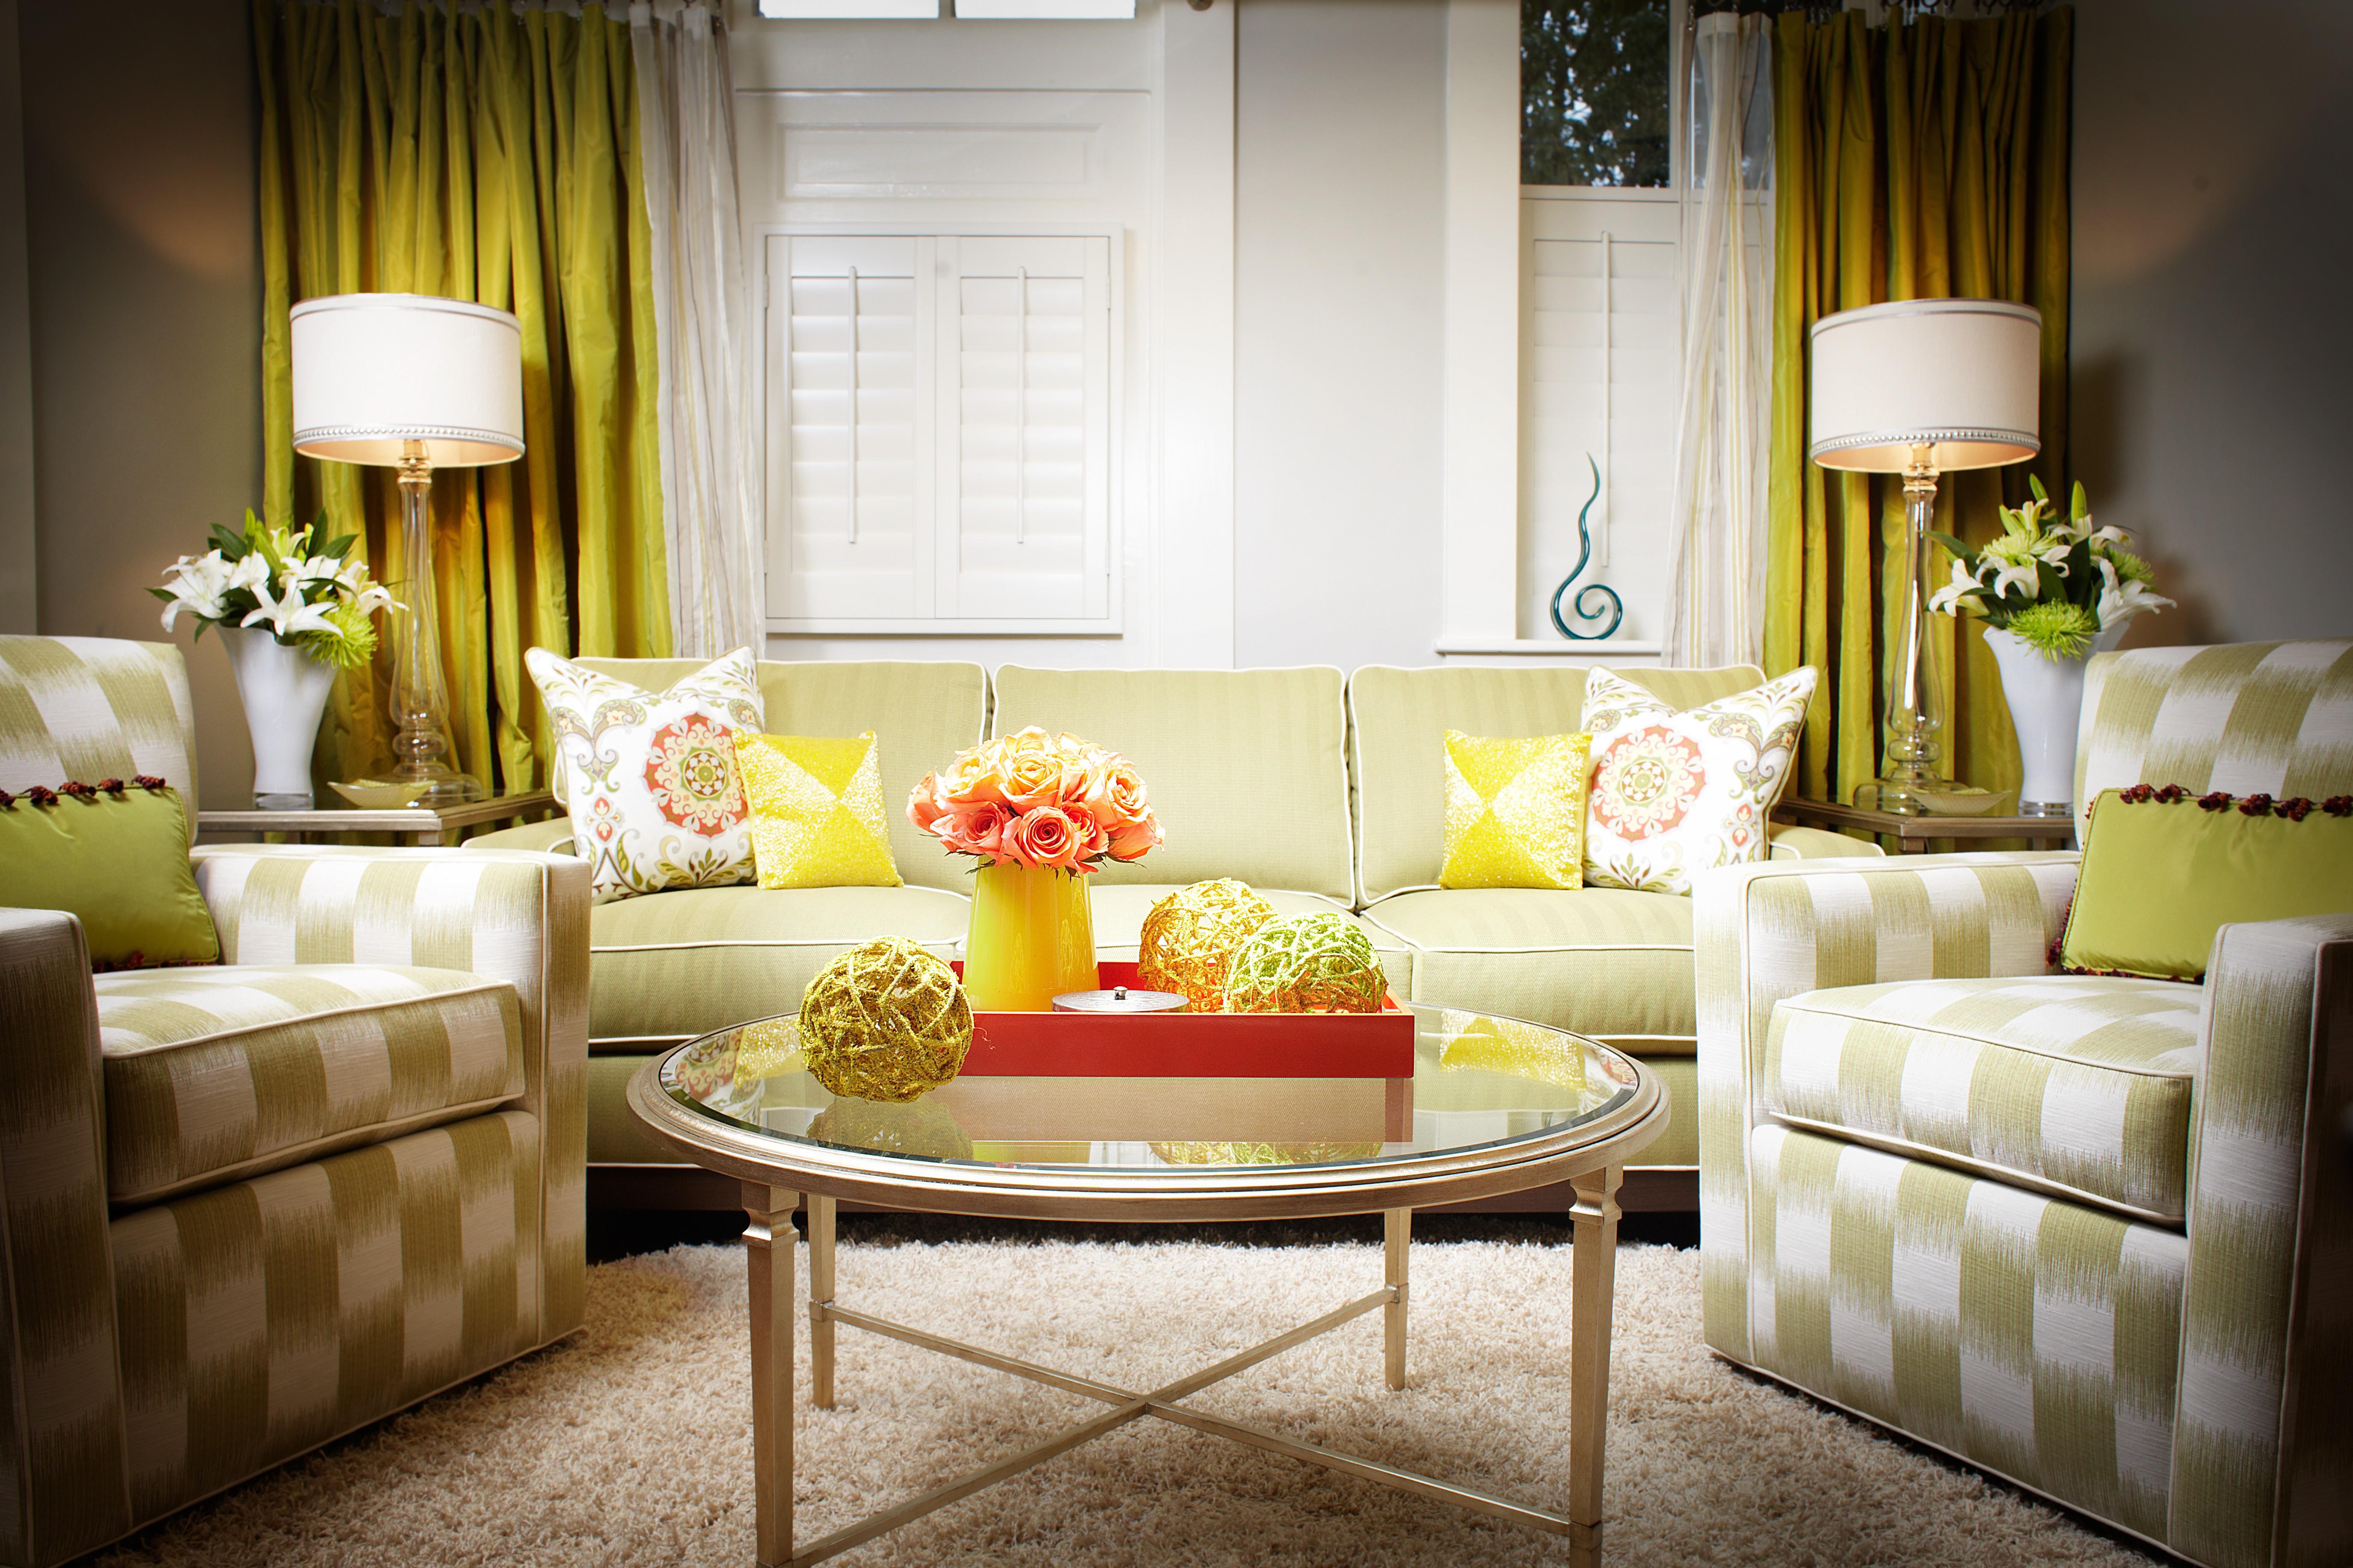 Kenn Gray, Ethan Allen   Paducah, KY   Interior Designer Or Decorator    Paducah, KY, United States